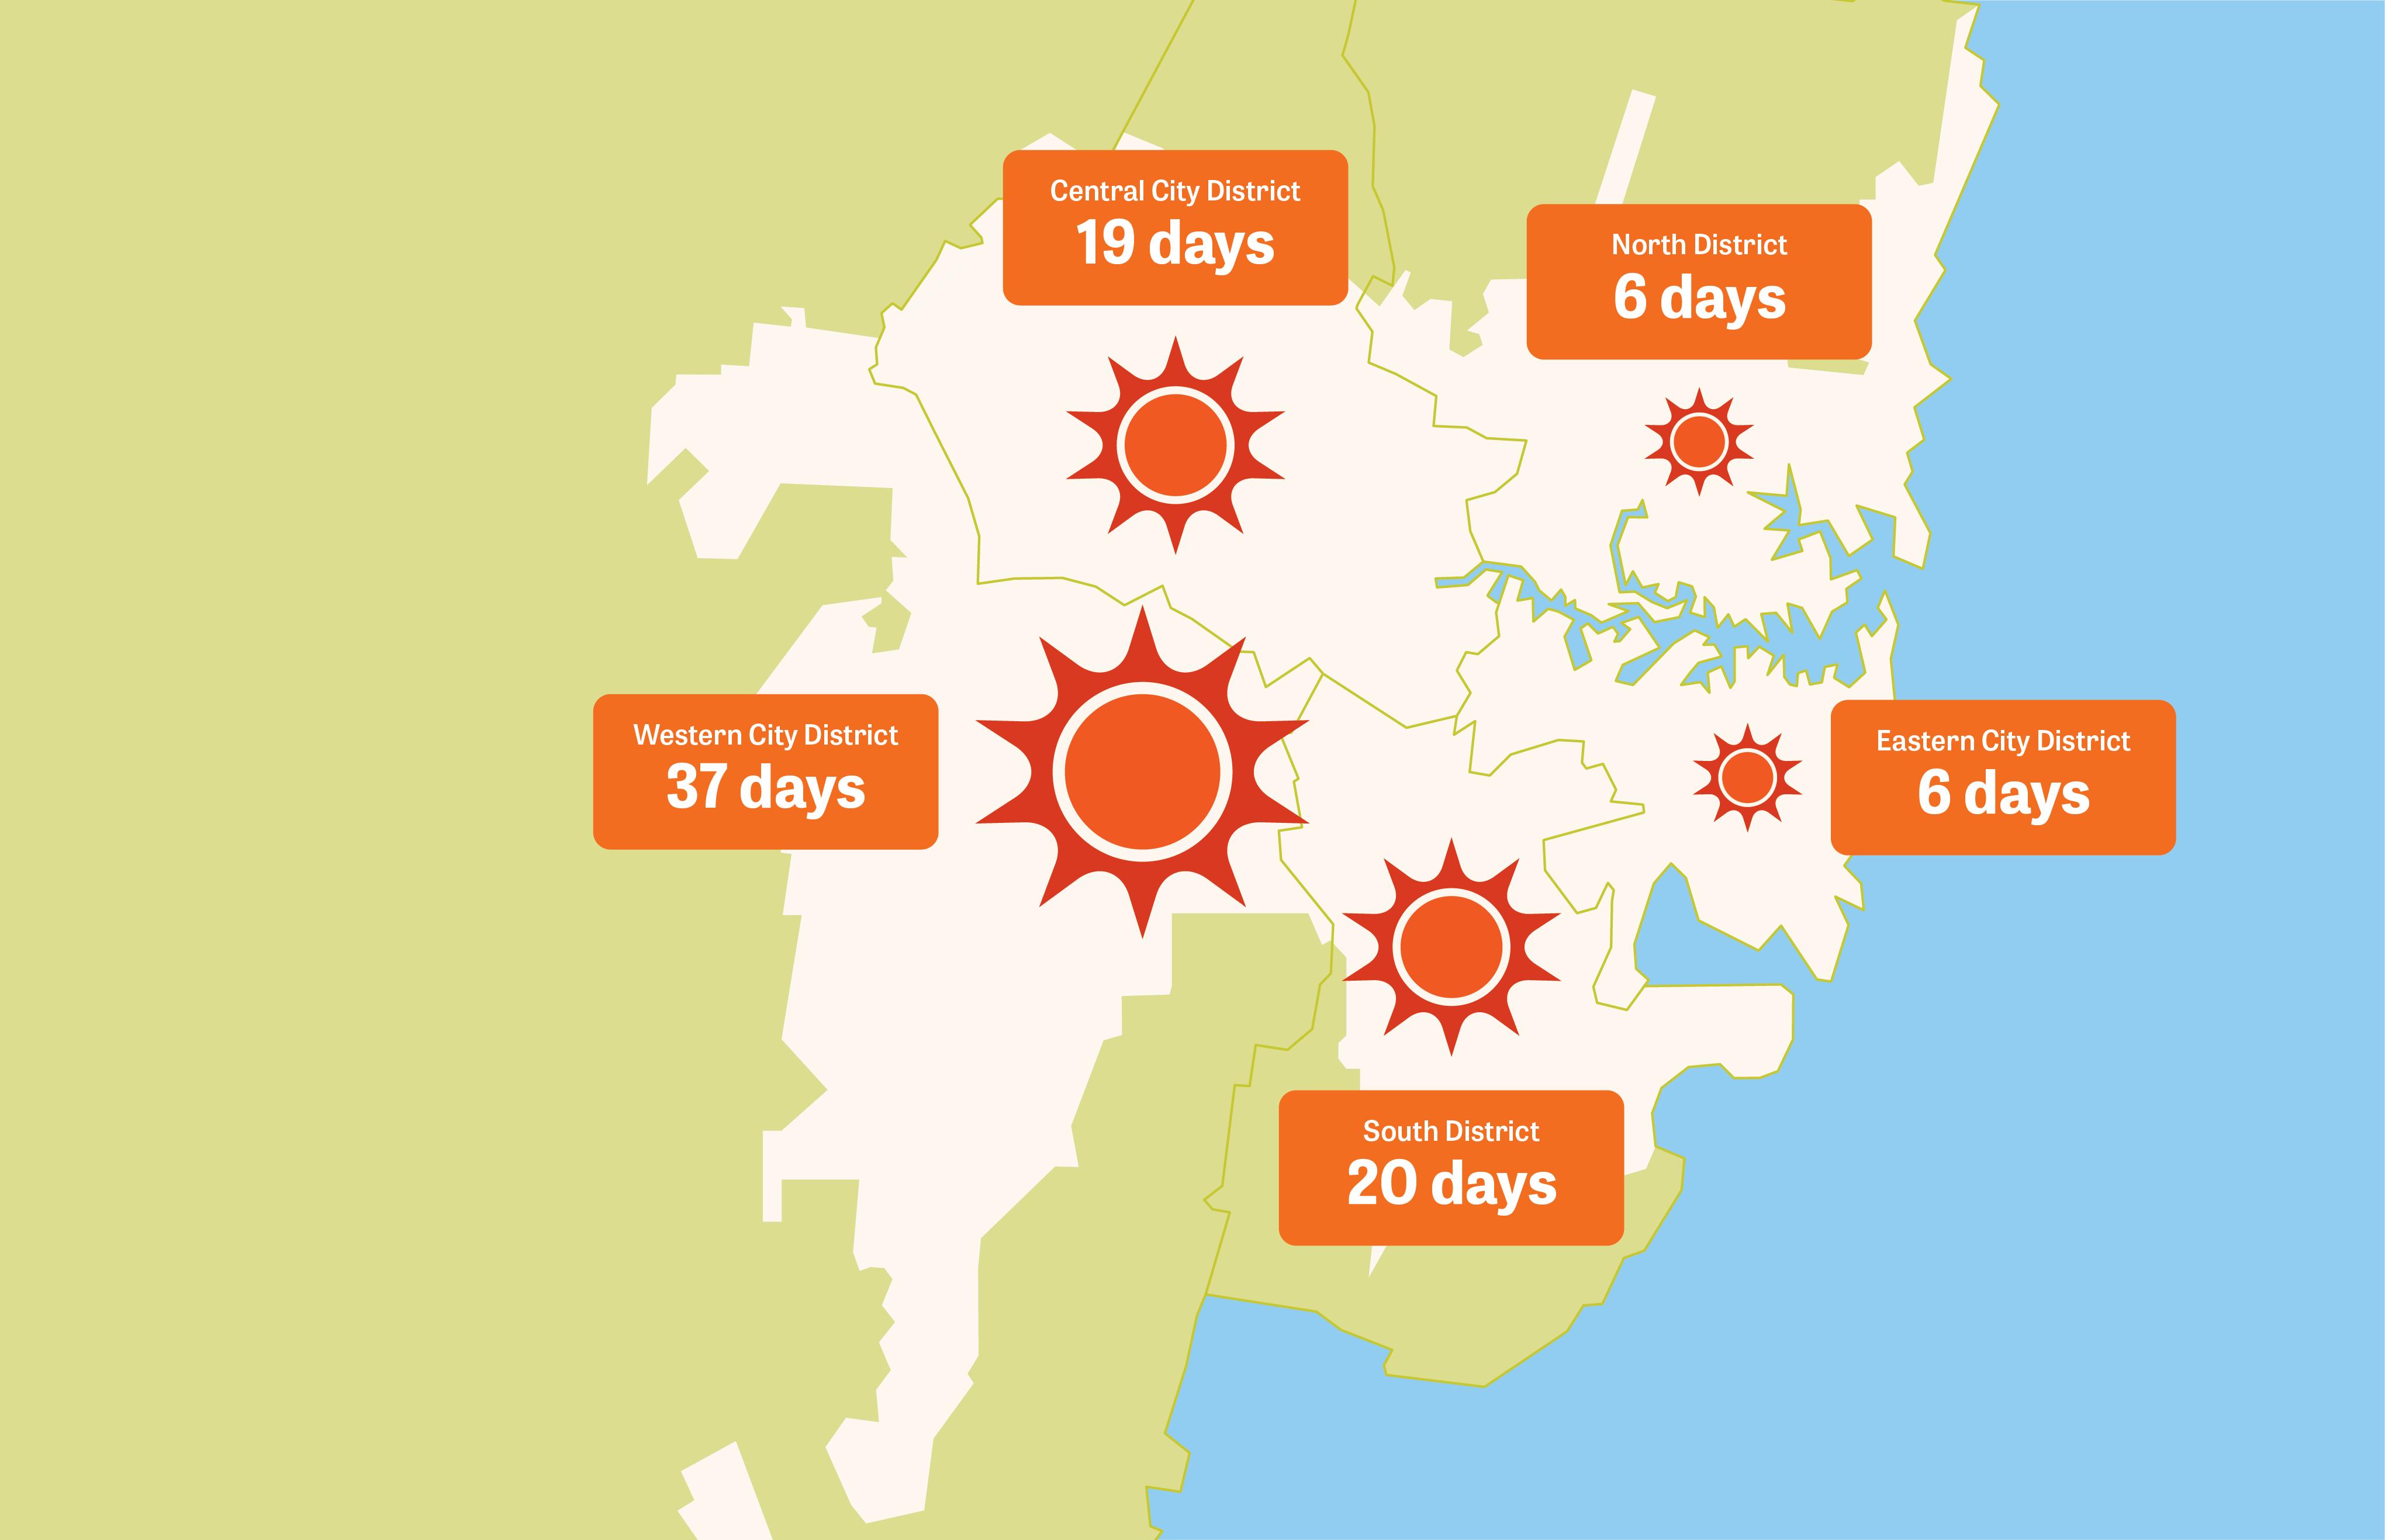 Number of days over 35 degrees Celsius (July 2018-June 2019)